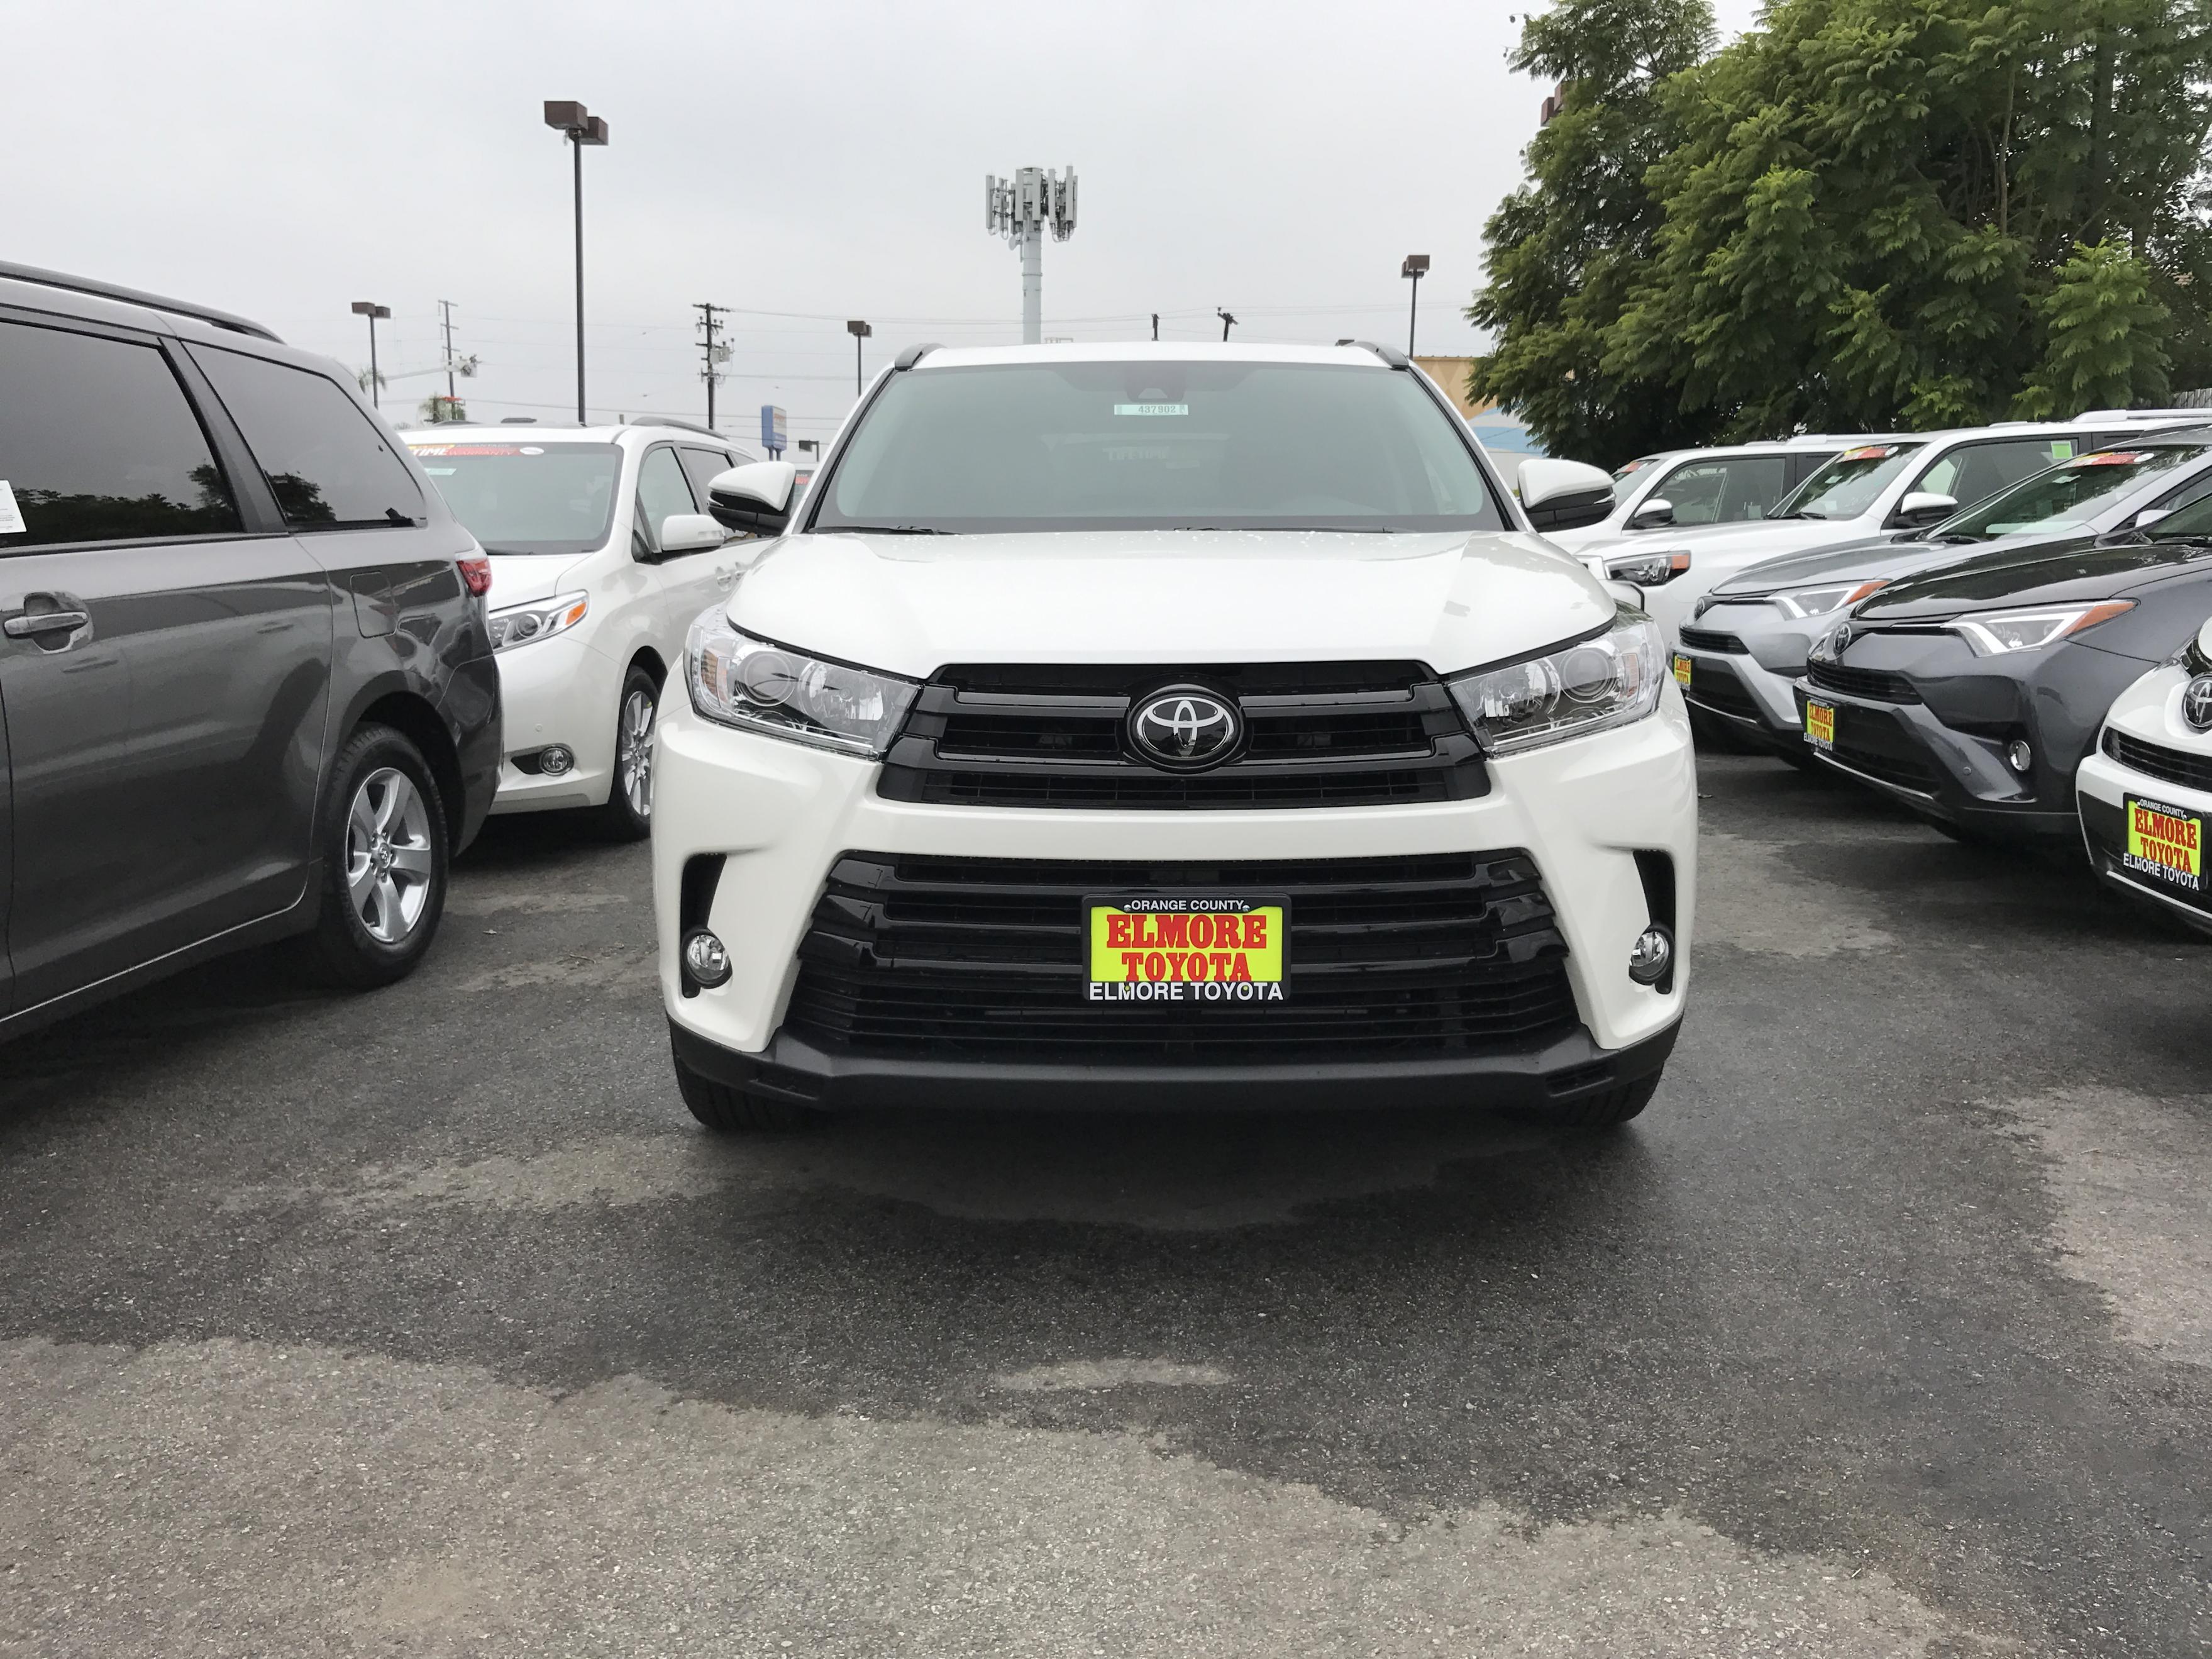 2017 Highlander Retrofit The Se Black Grill Toyota